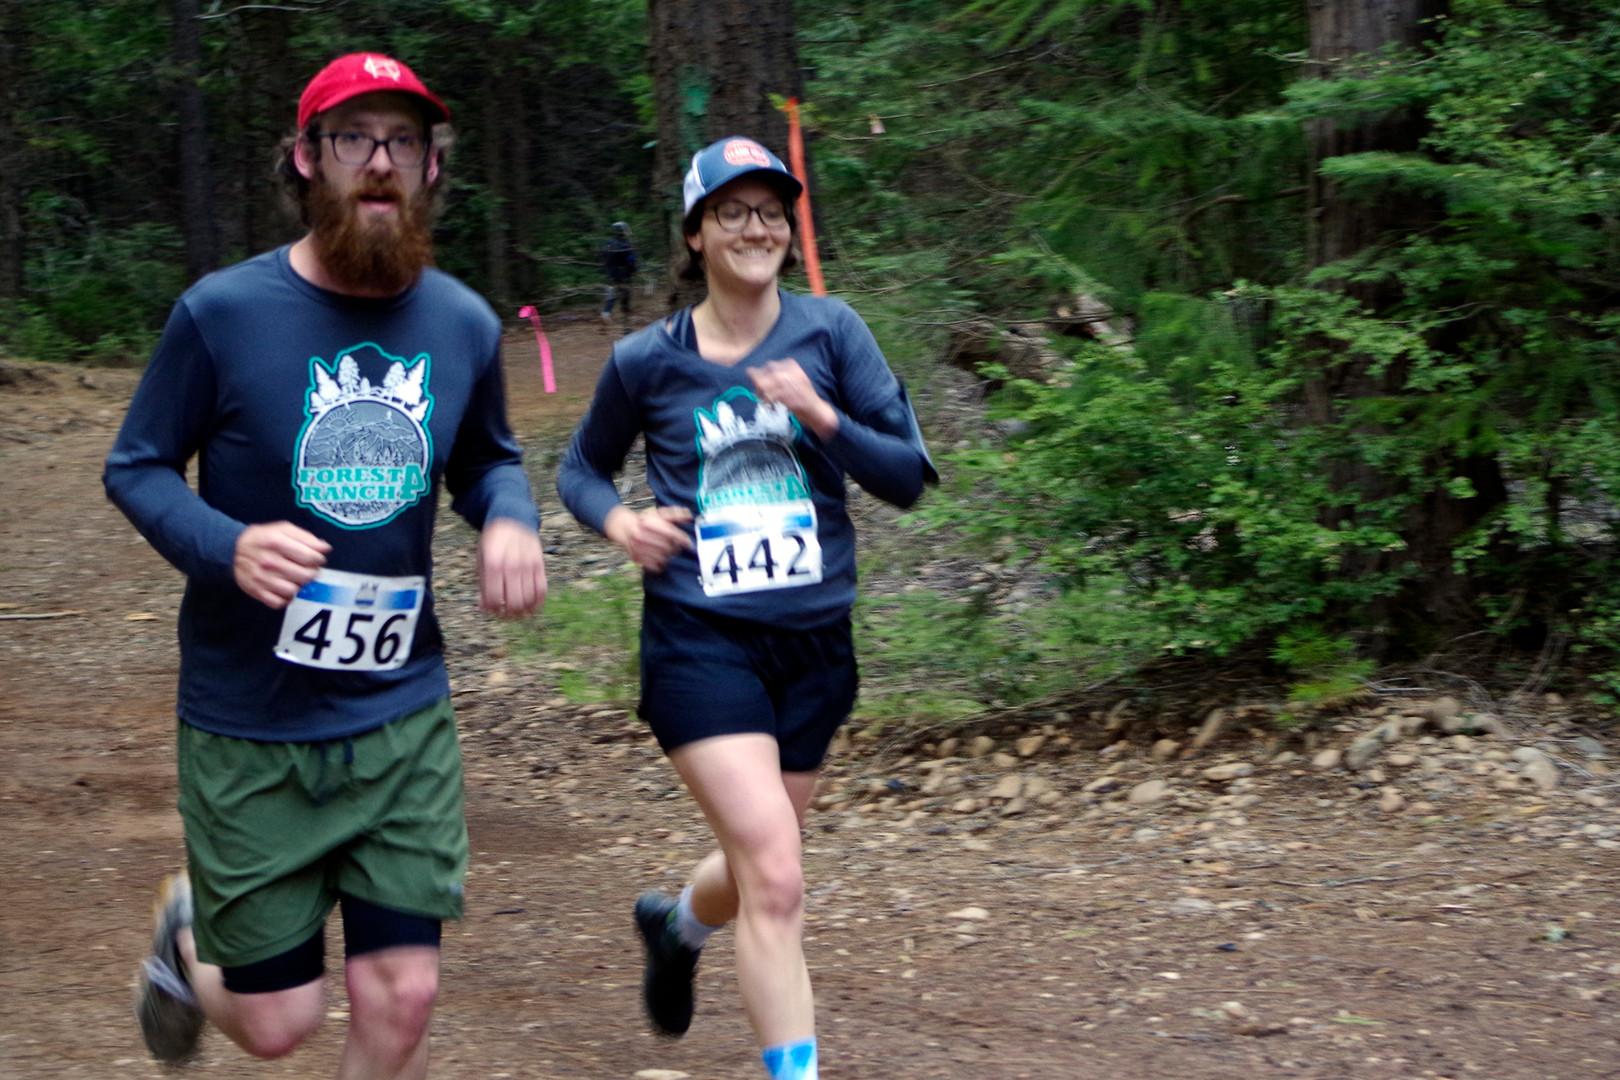 2 happy runners.jpg